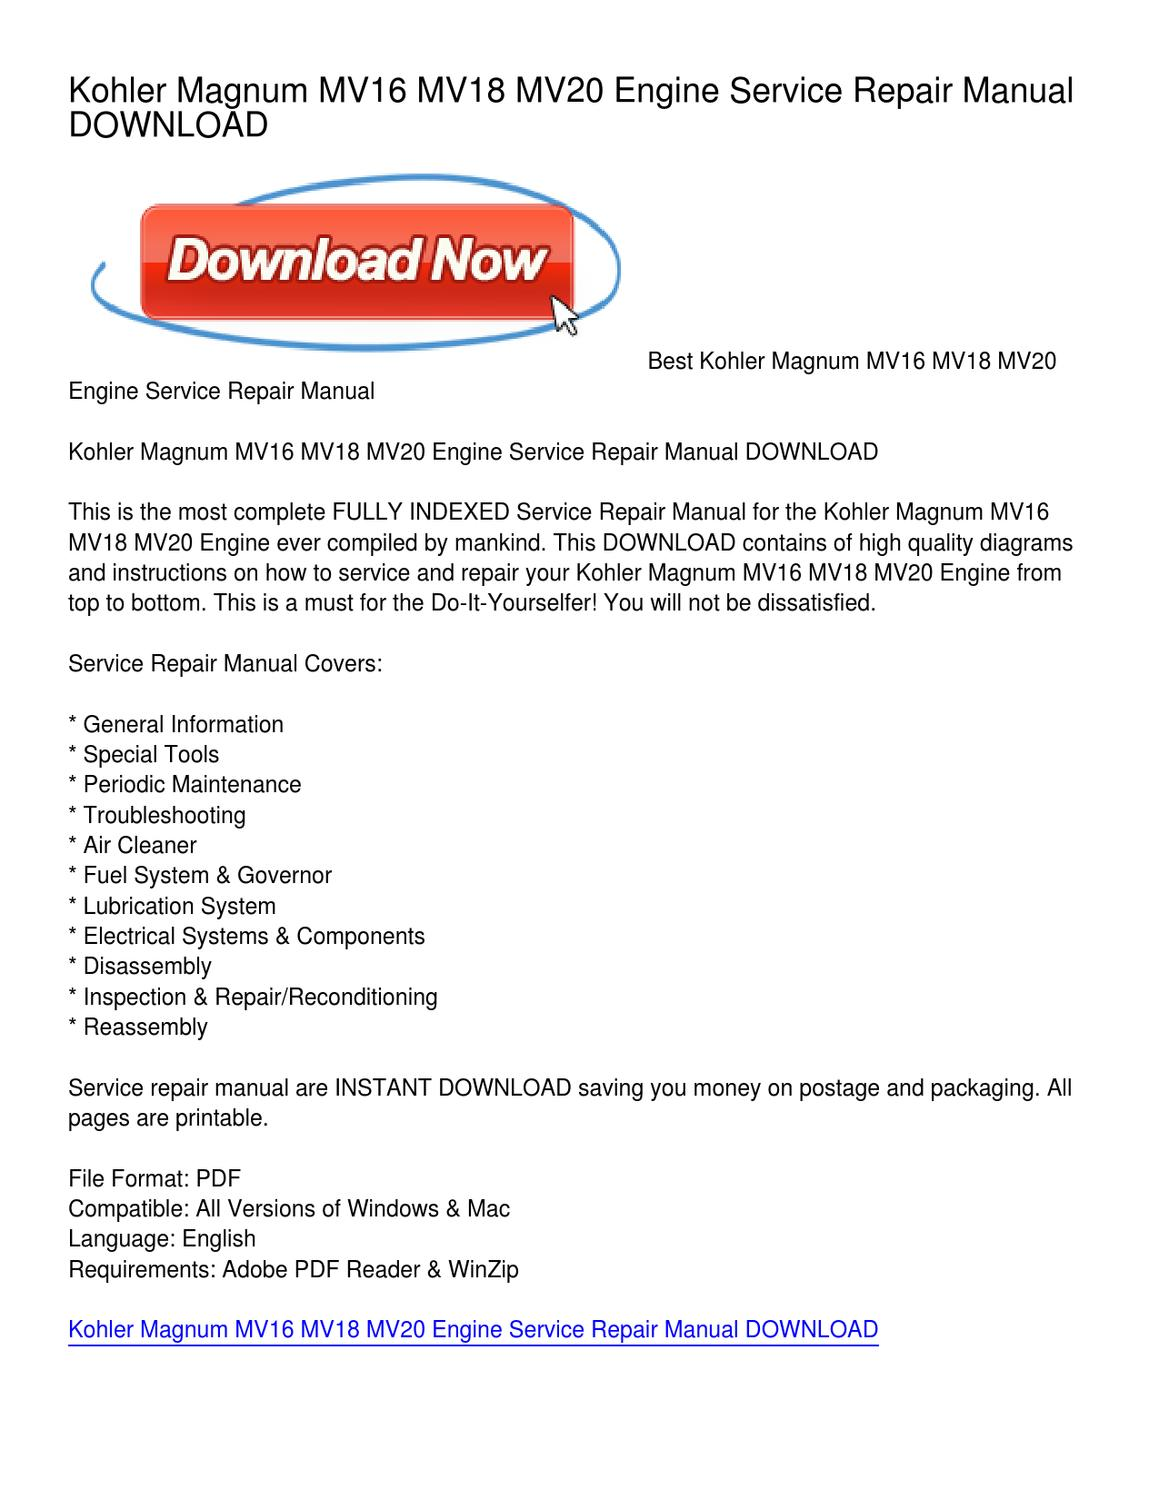 Kohler Magnum MV16 MV18 MV20 Engine Service Repair Manual DOWNLOAD by Dora  Warner - issuu